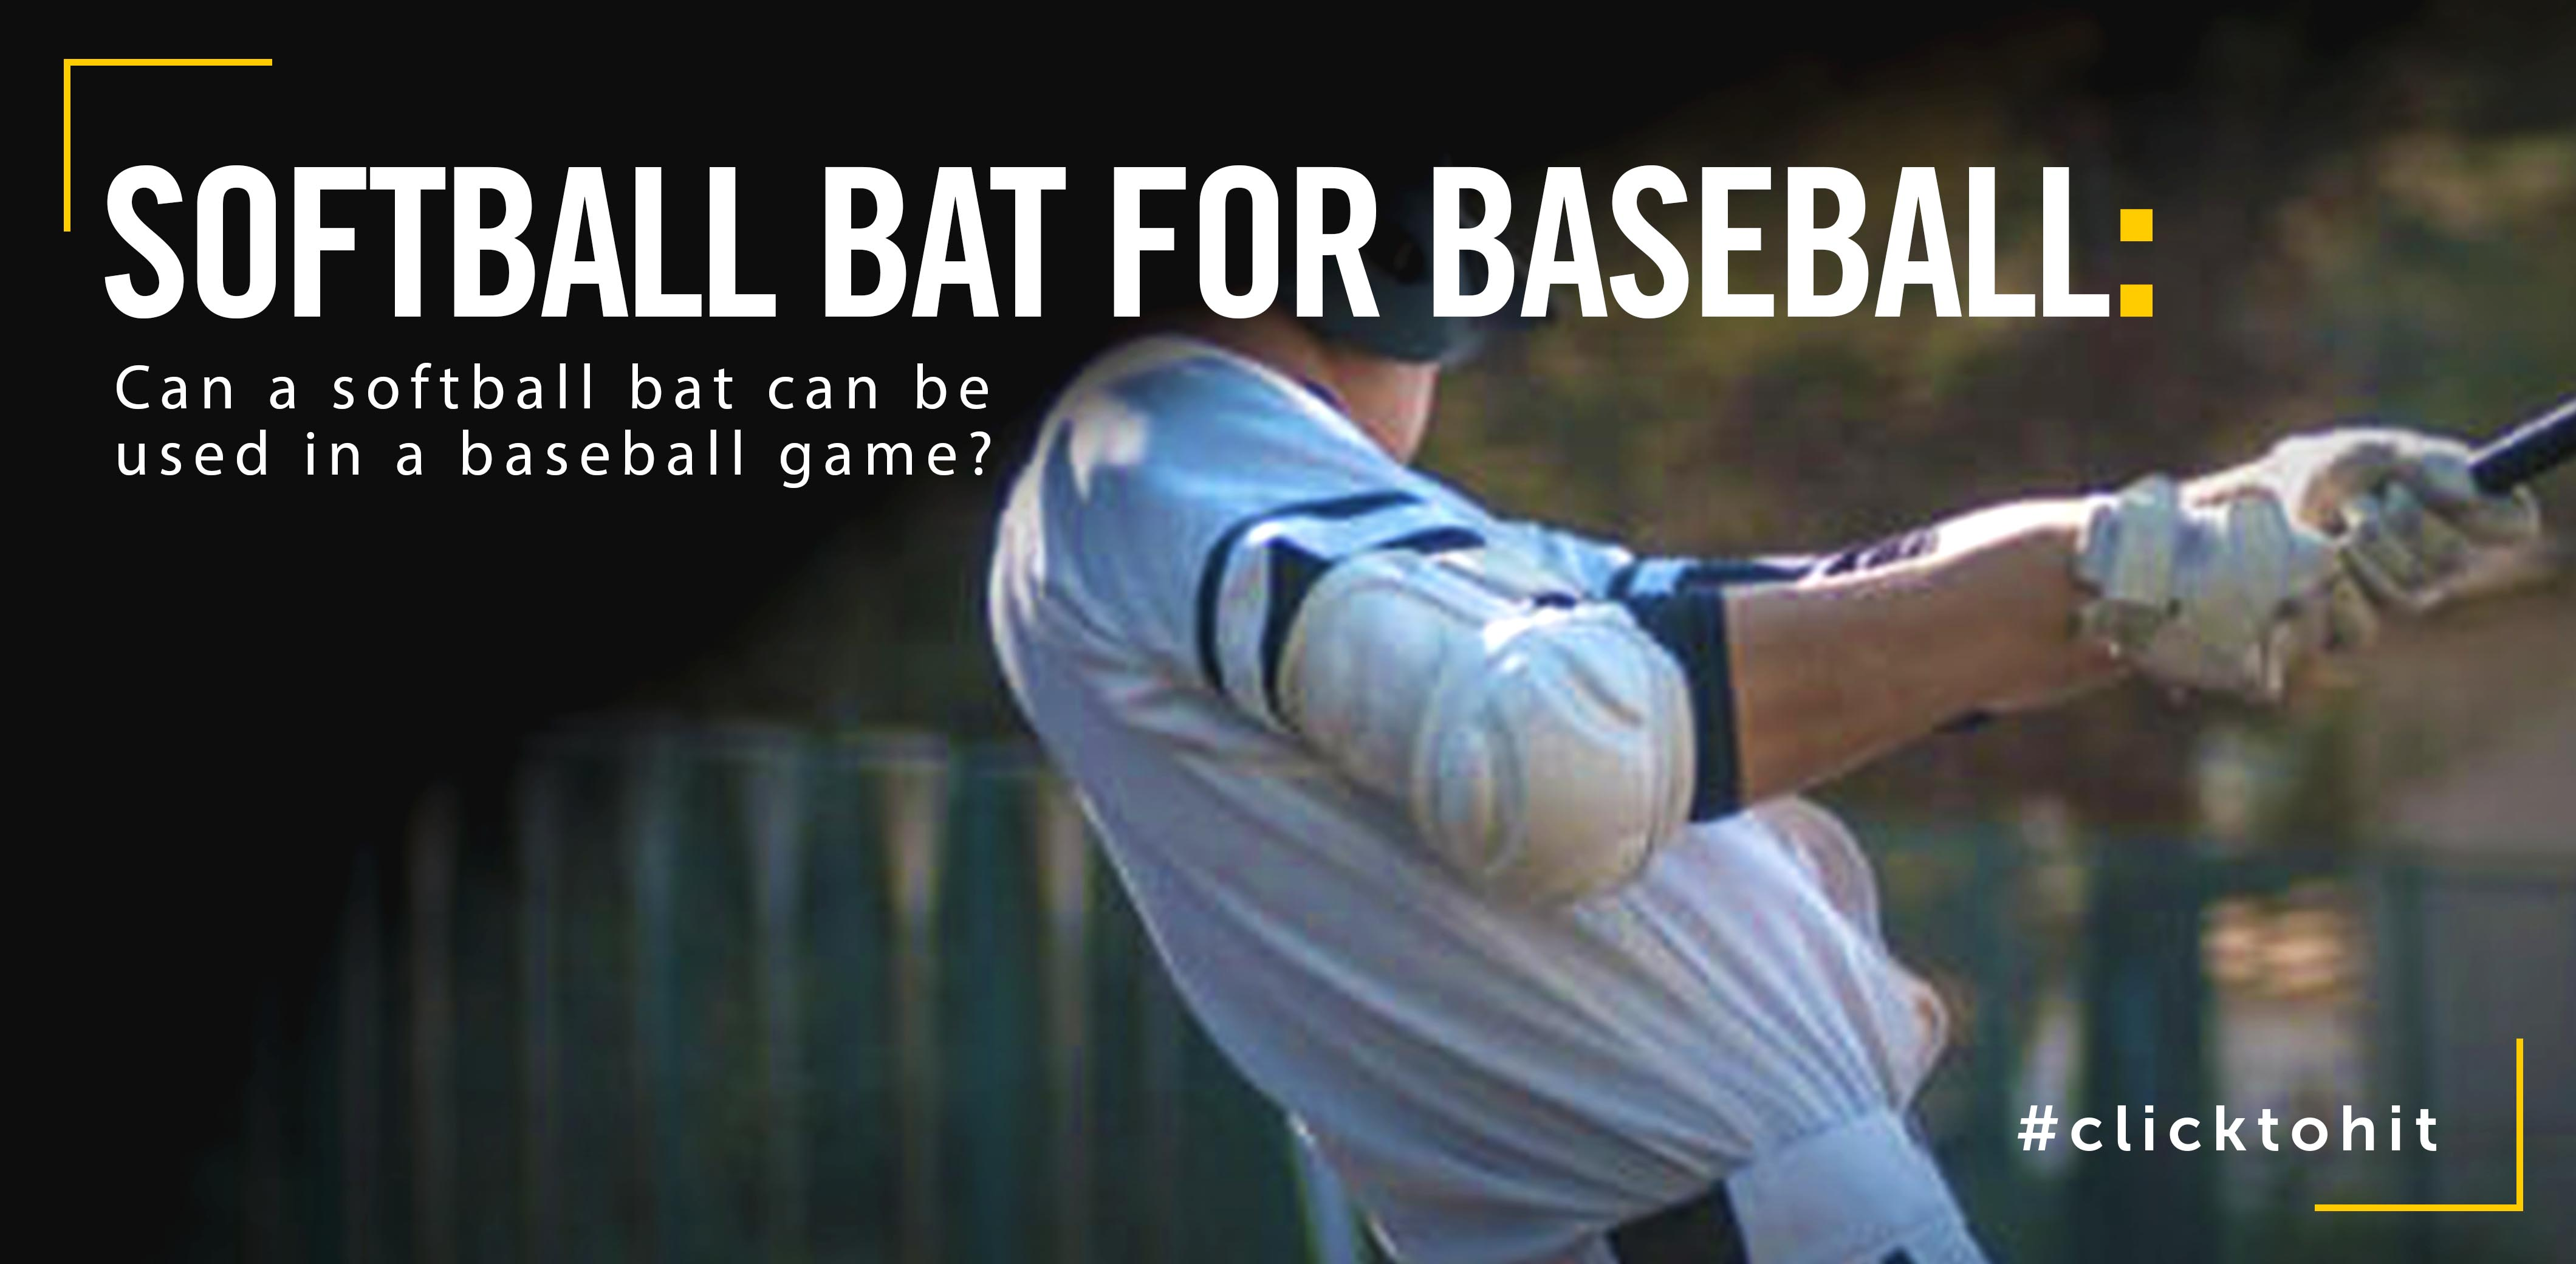 Can a softball bat be used in baseball